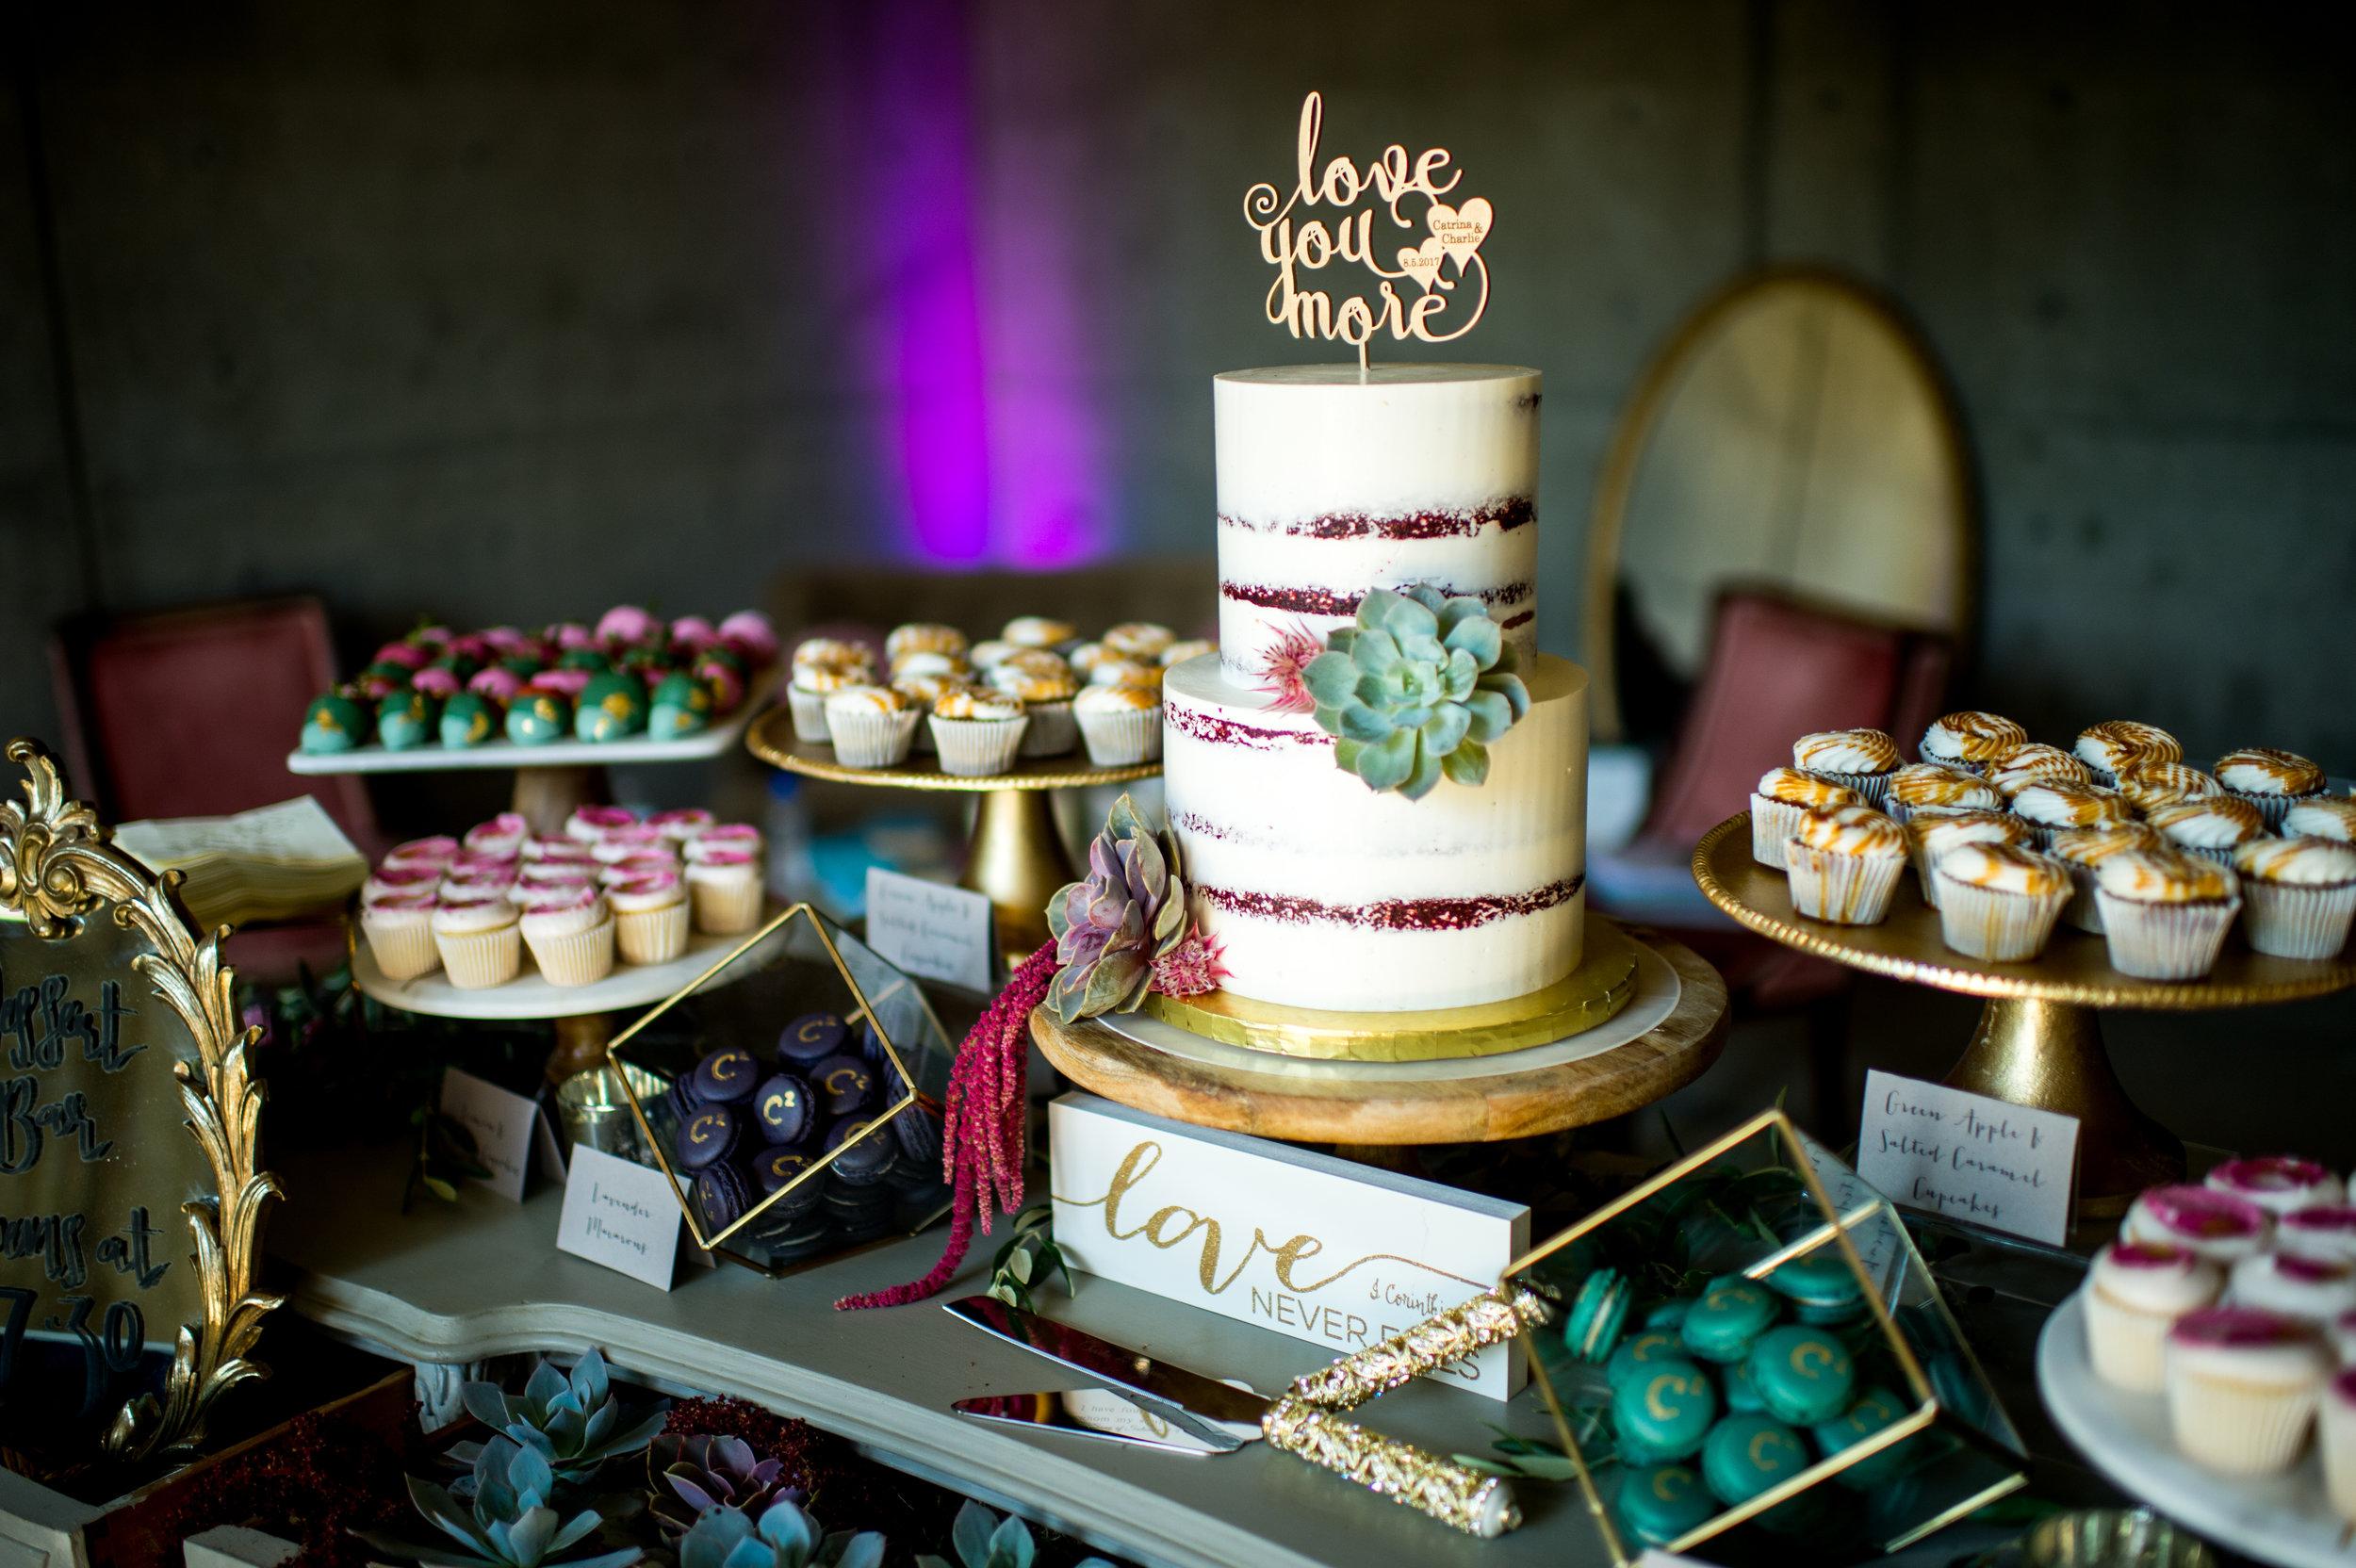 20170805-Catrina-and-Charlie-Wedding-Final-Edit-2797 copy.jpg